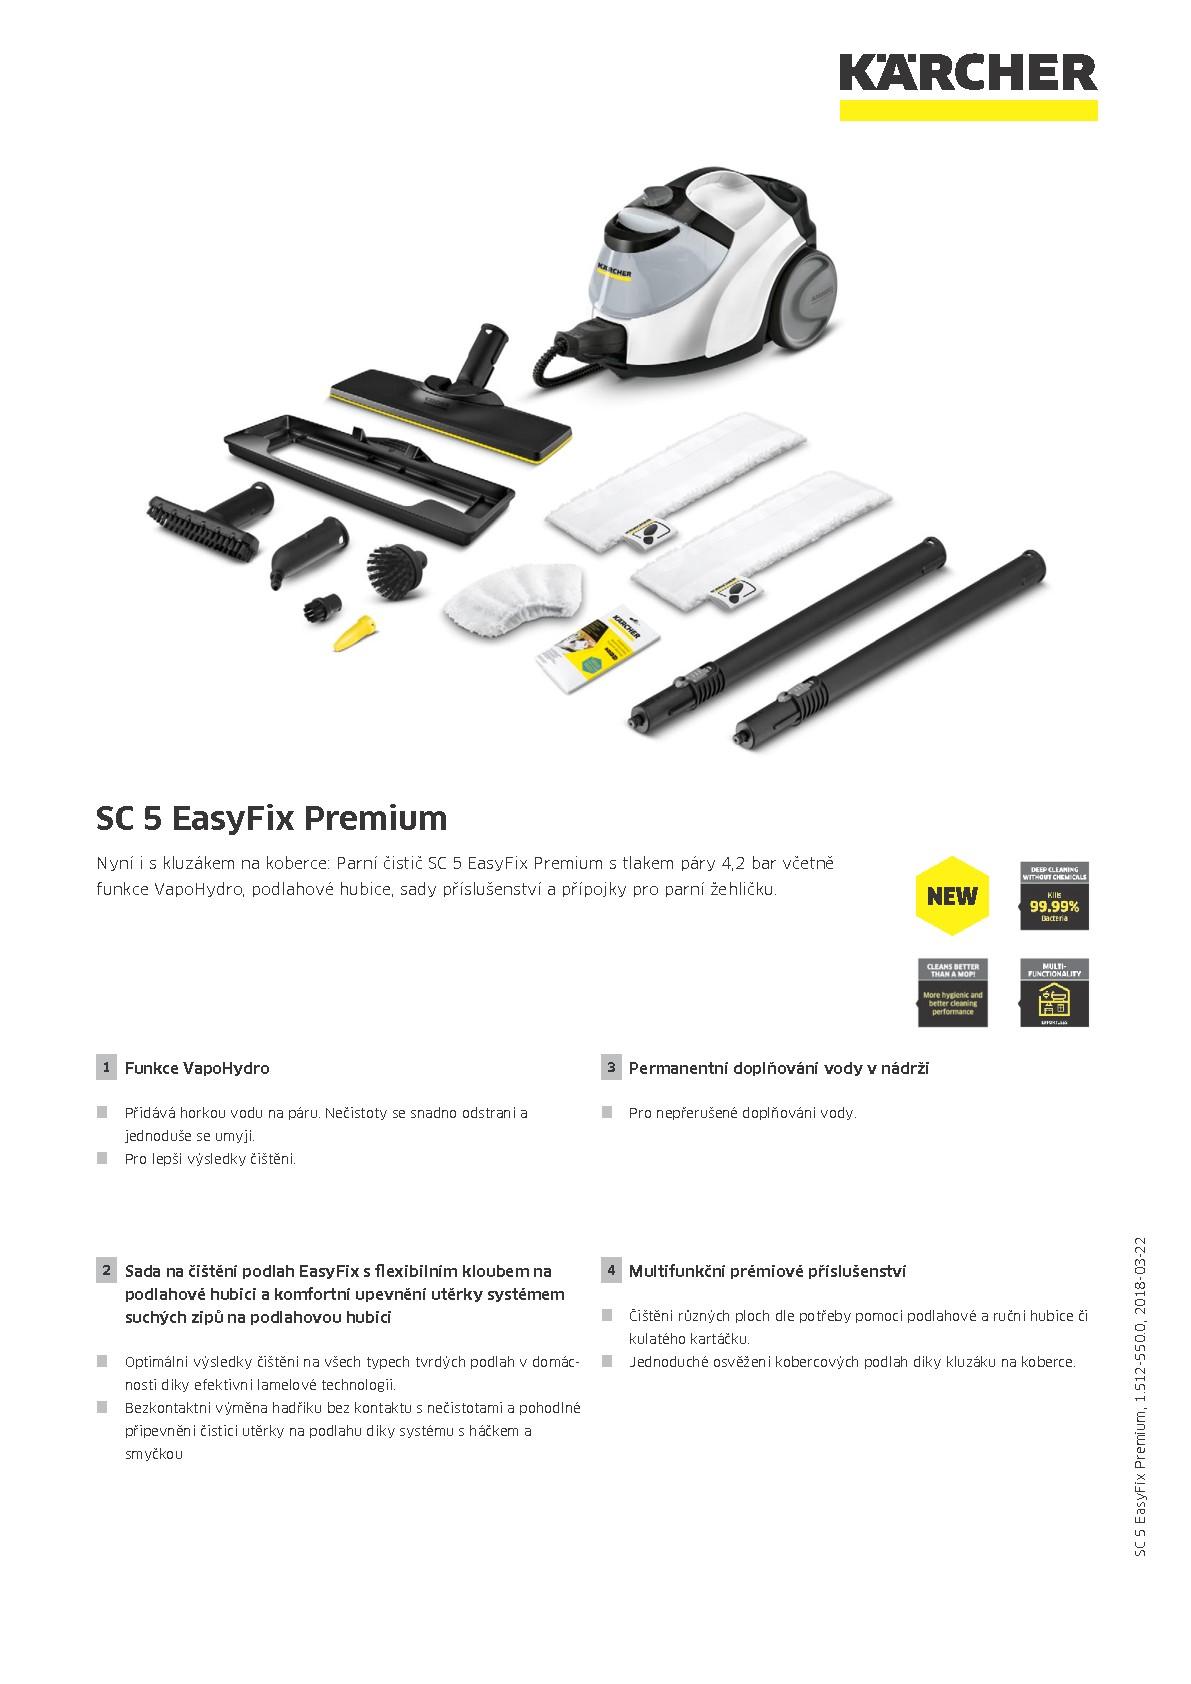 k rcher sc 5 easyfix premium parn isti k rcher center rea. Black Bedroom Furniture Sets. Home Design Ideas